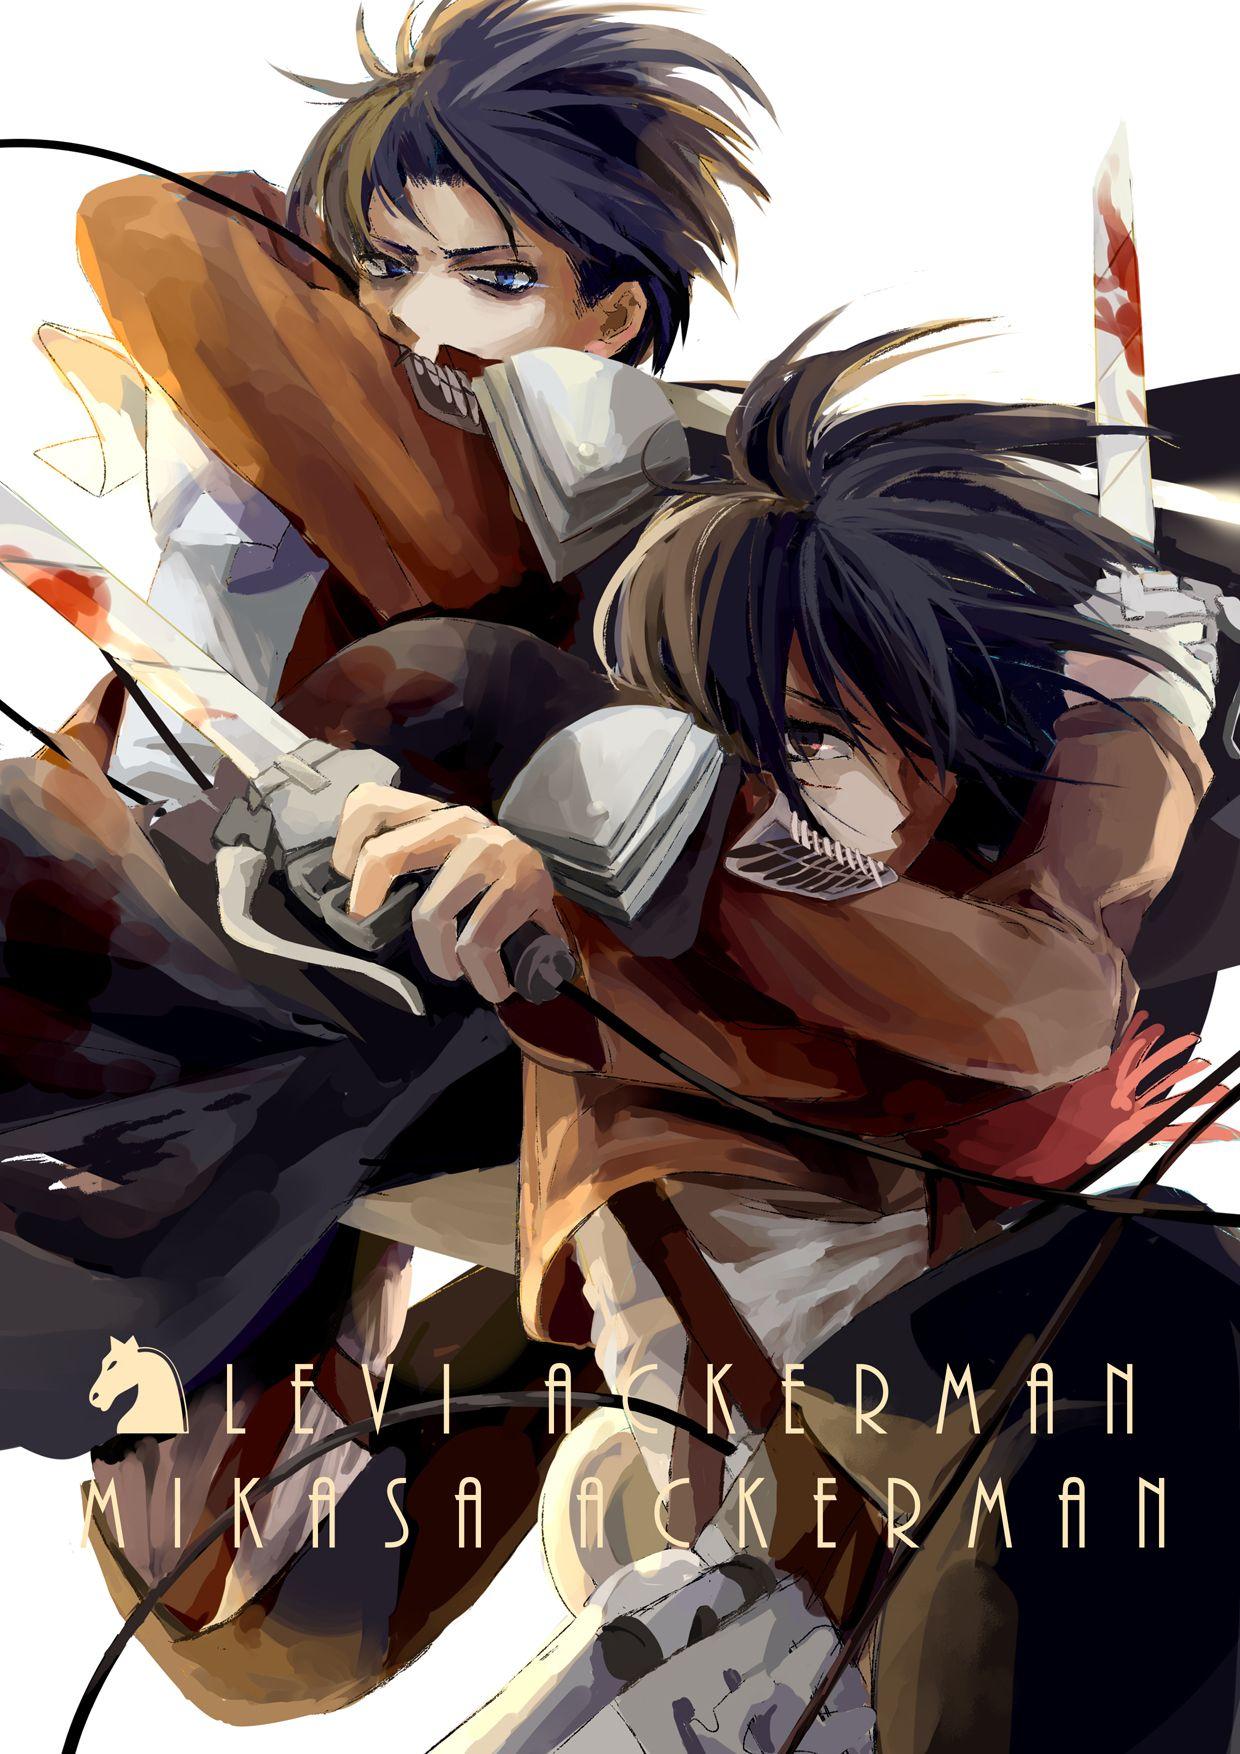 Attack On Titan Tumblr Attack On Titan Anime Attack On Titan Levi Mikasa